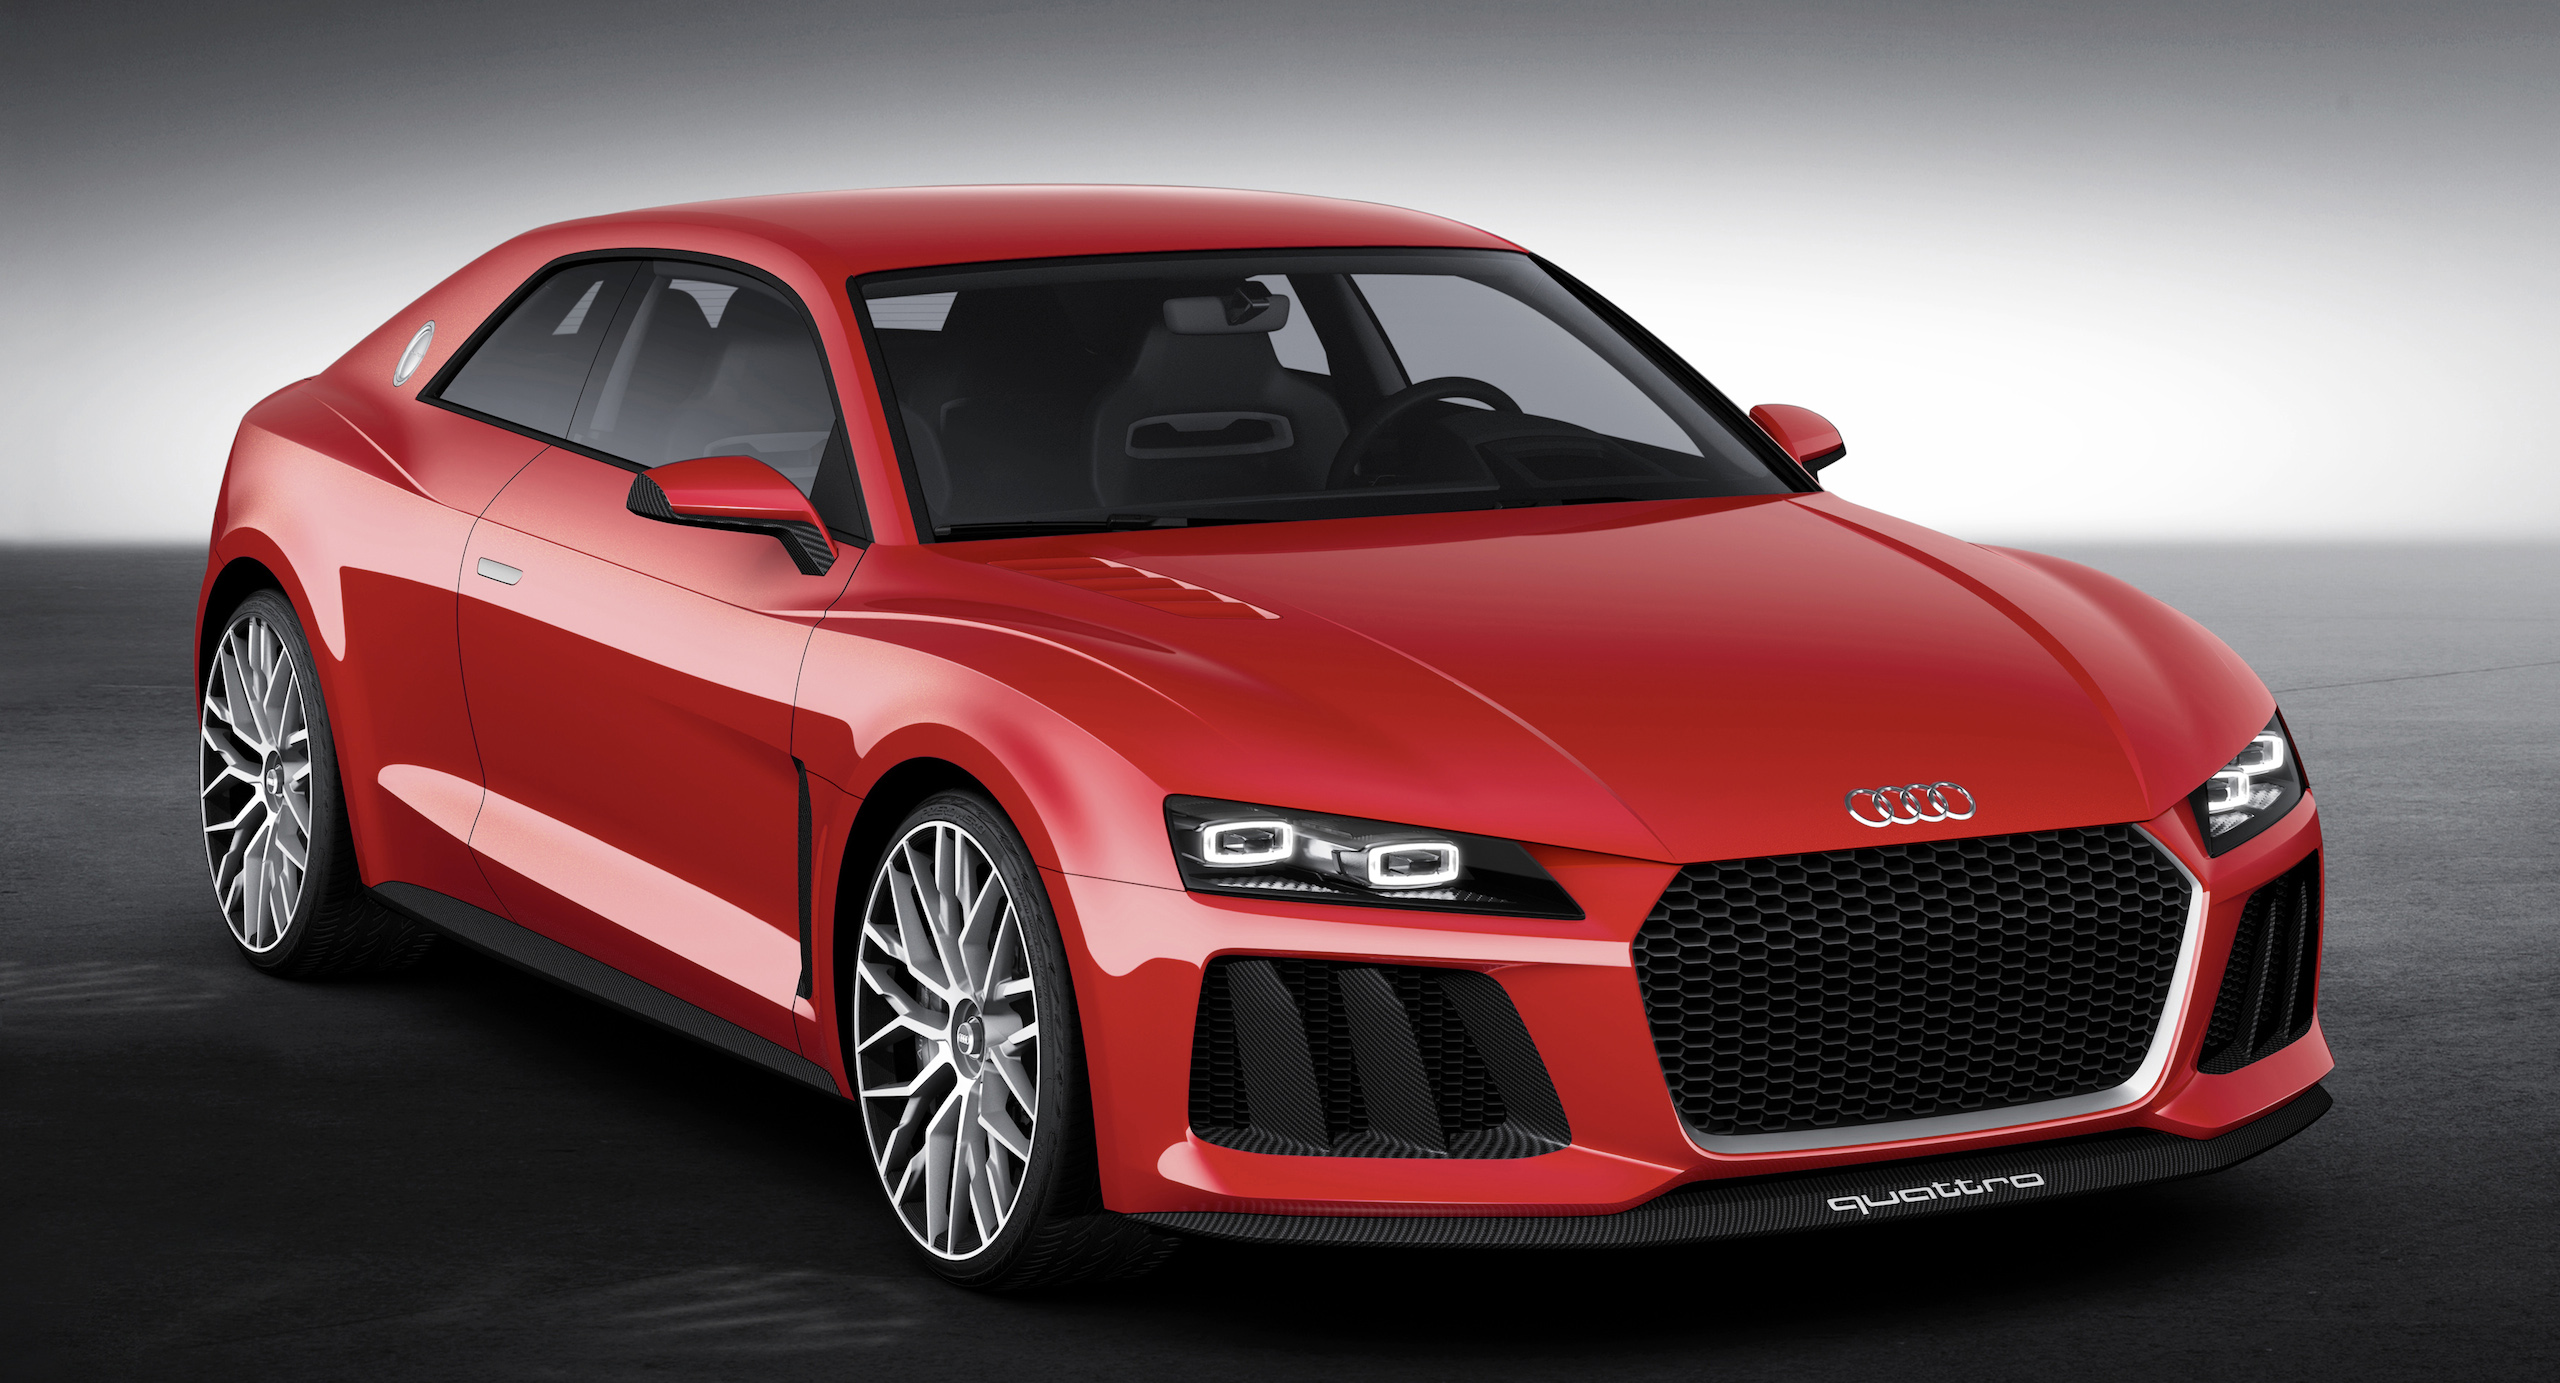 Audi Sport Quattro Laserlight Concept Welcomes 2014 Image